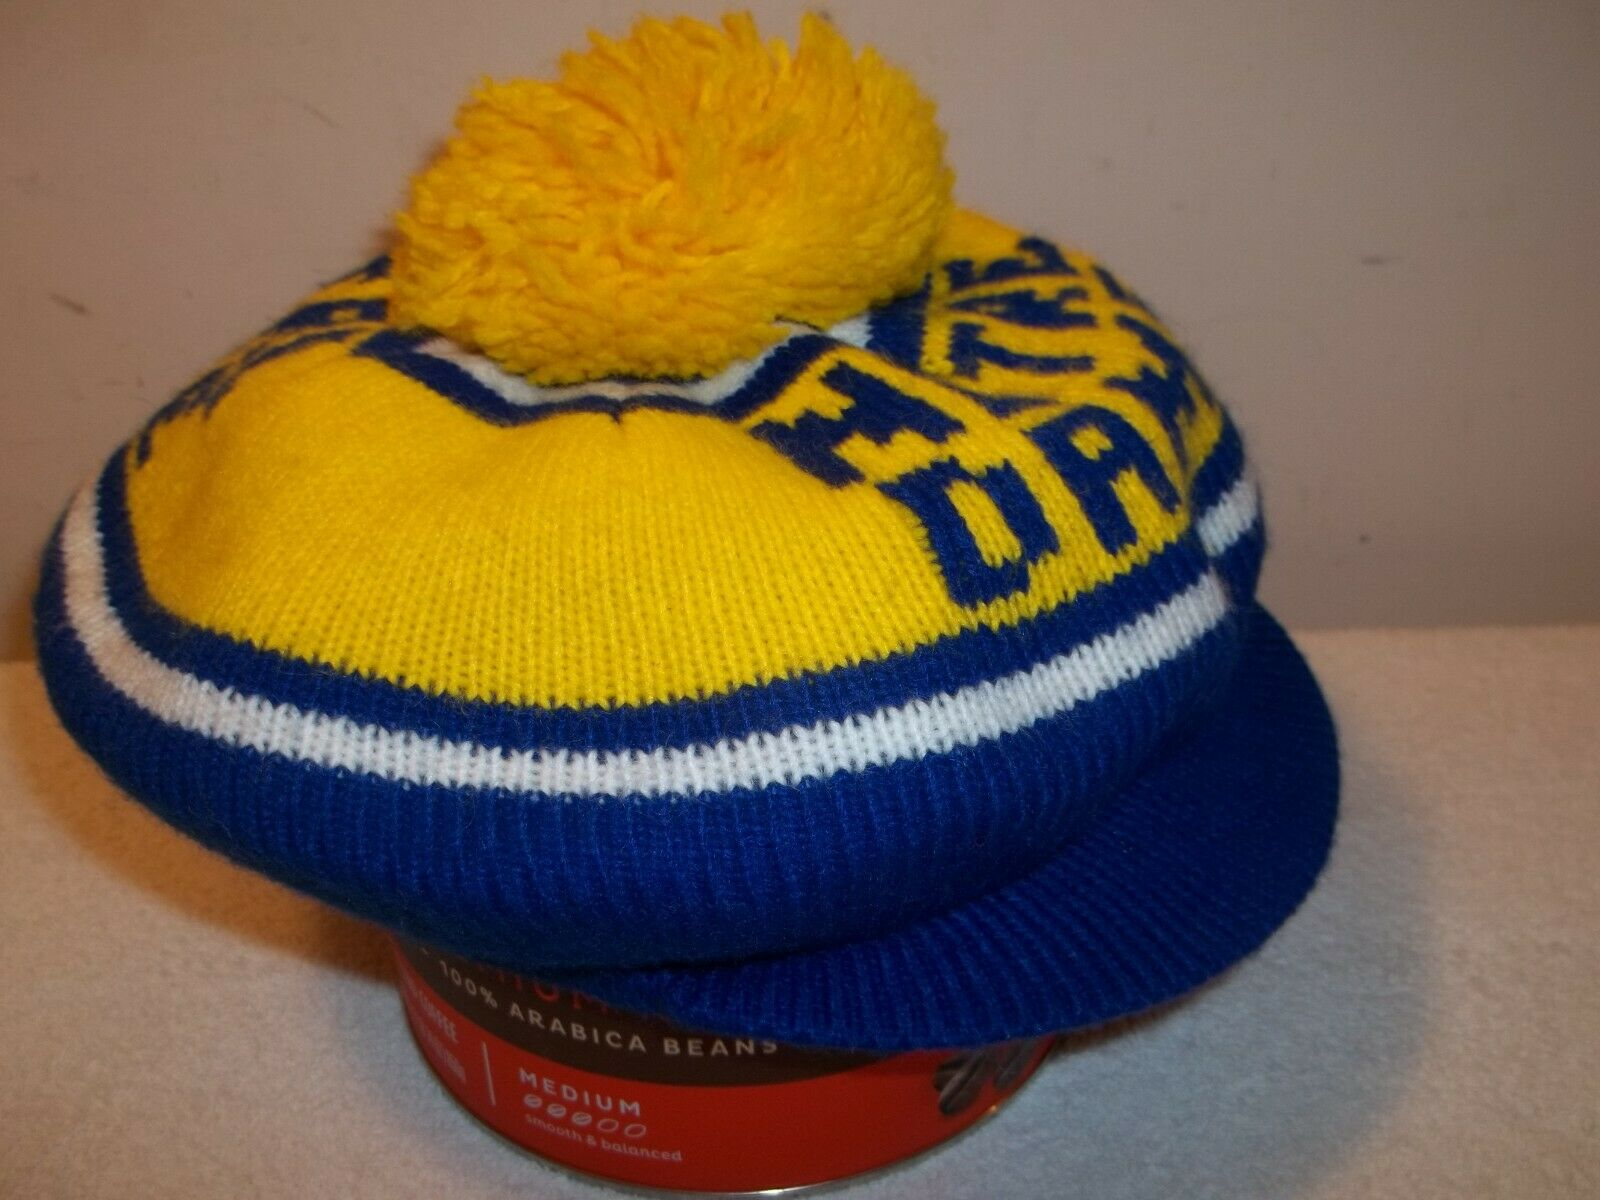 Vtg NCAA NOTRE DAME WINTER NEWSBOY CABBIE POM POM HAT Blue & Yellow